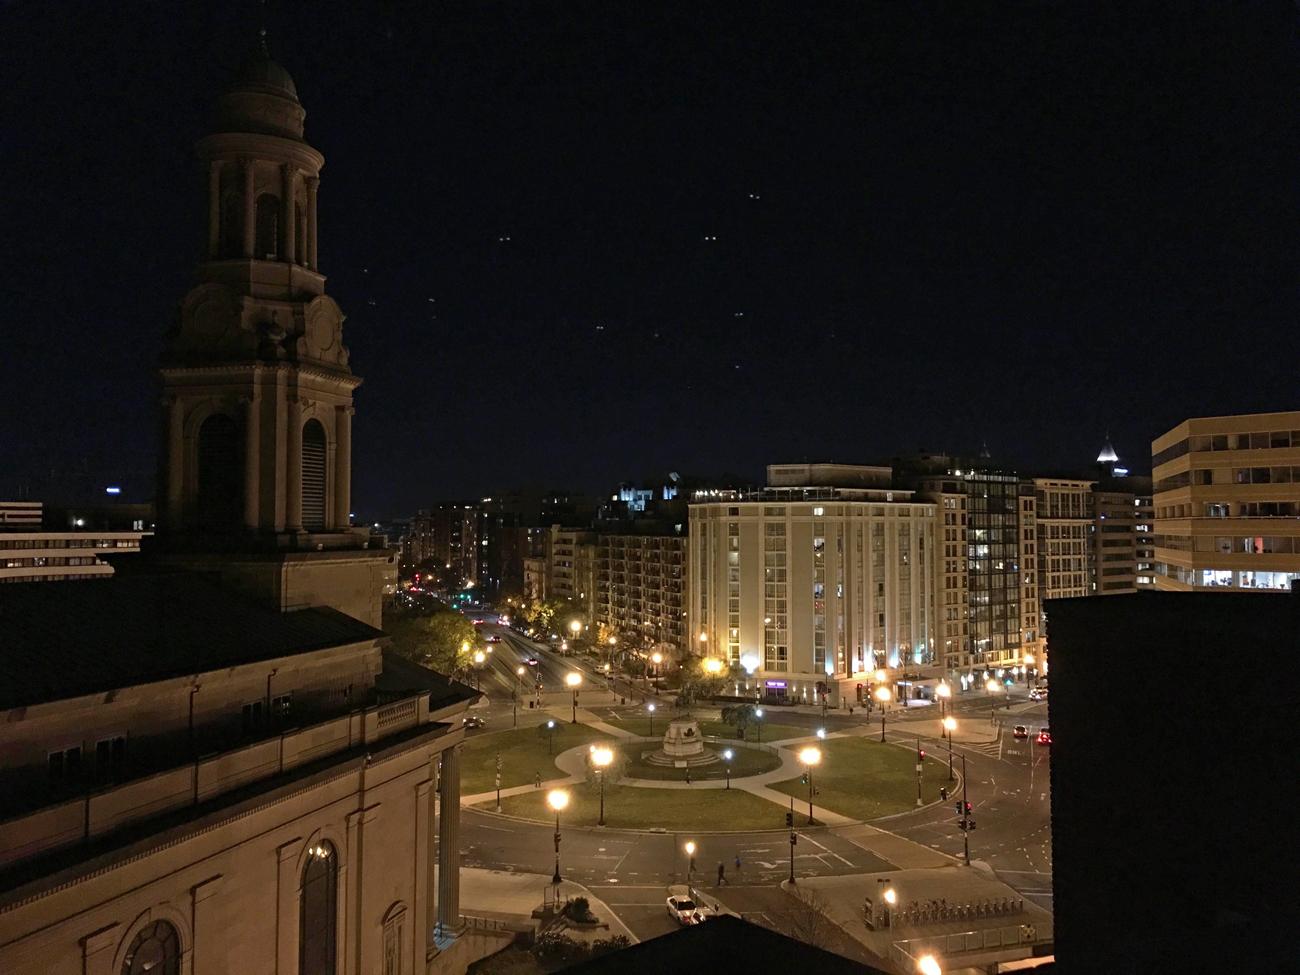 Nighttime view of Thomas Circle all lit up in Washington, D.C.